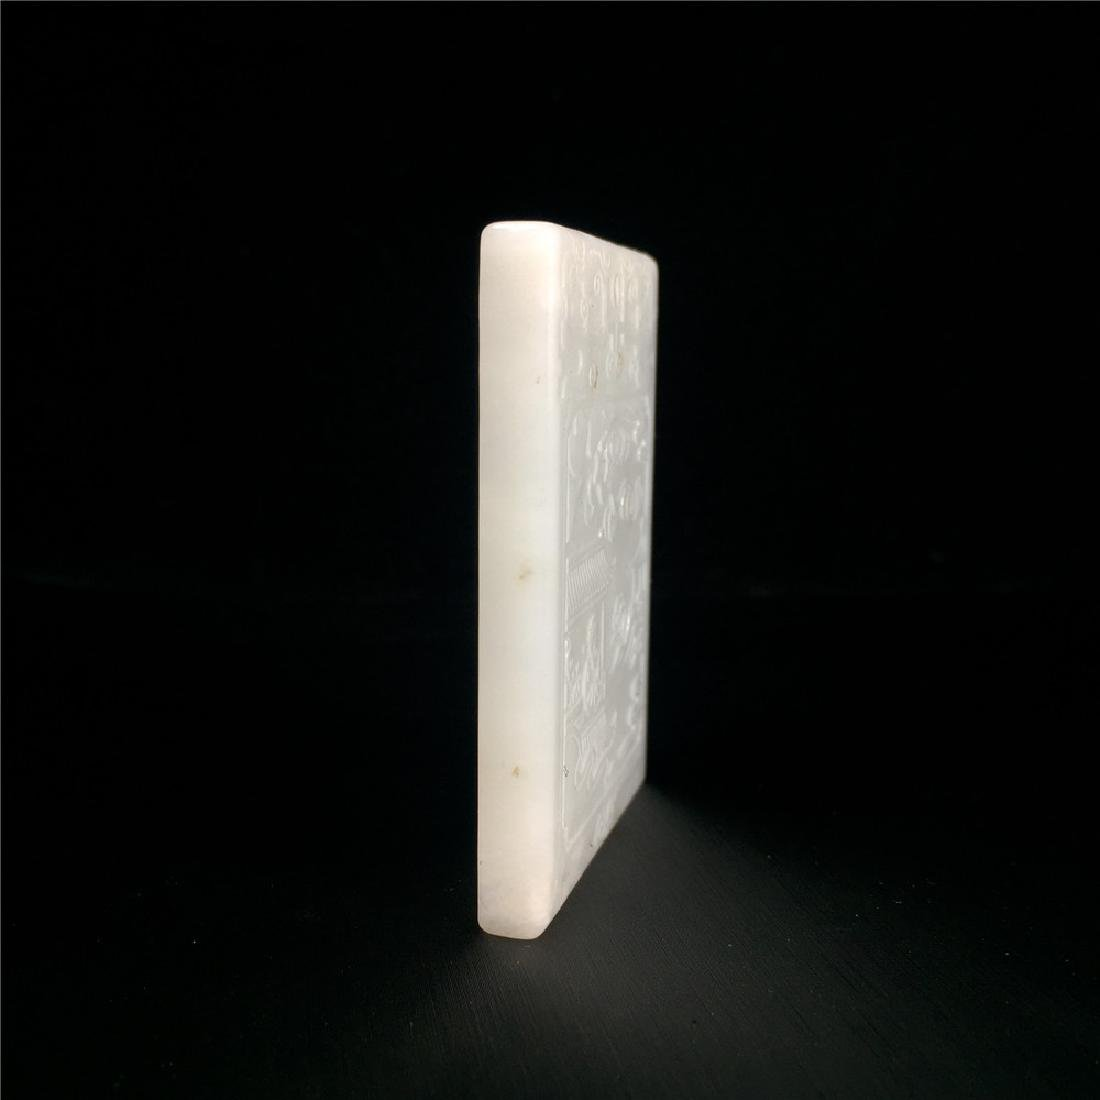 Chinese Qing Dynasty Hetian White Jade Pendant - 3